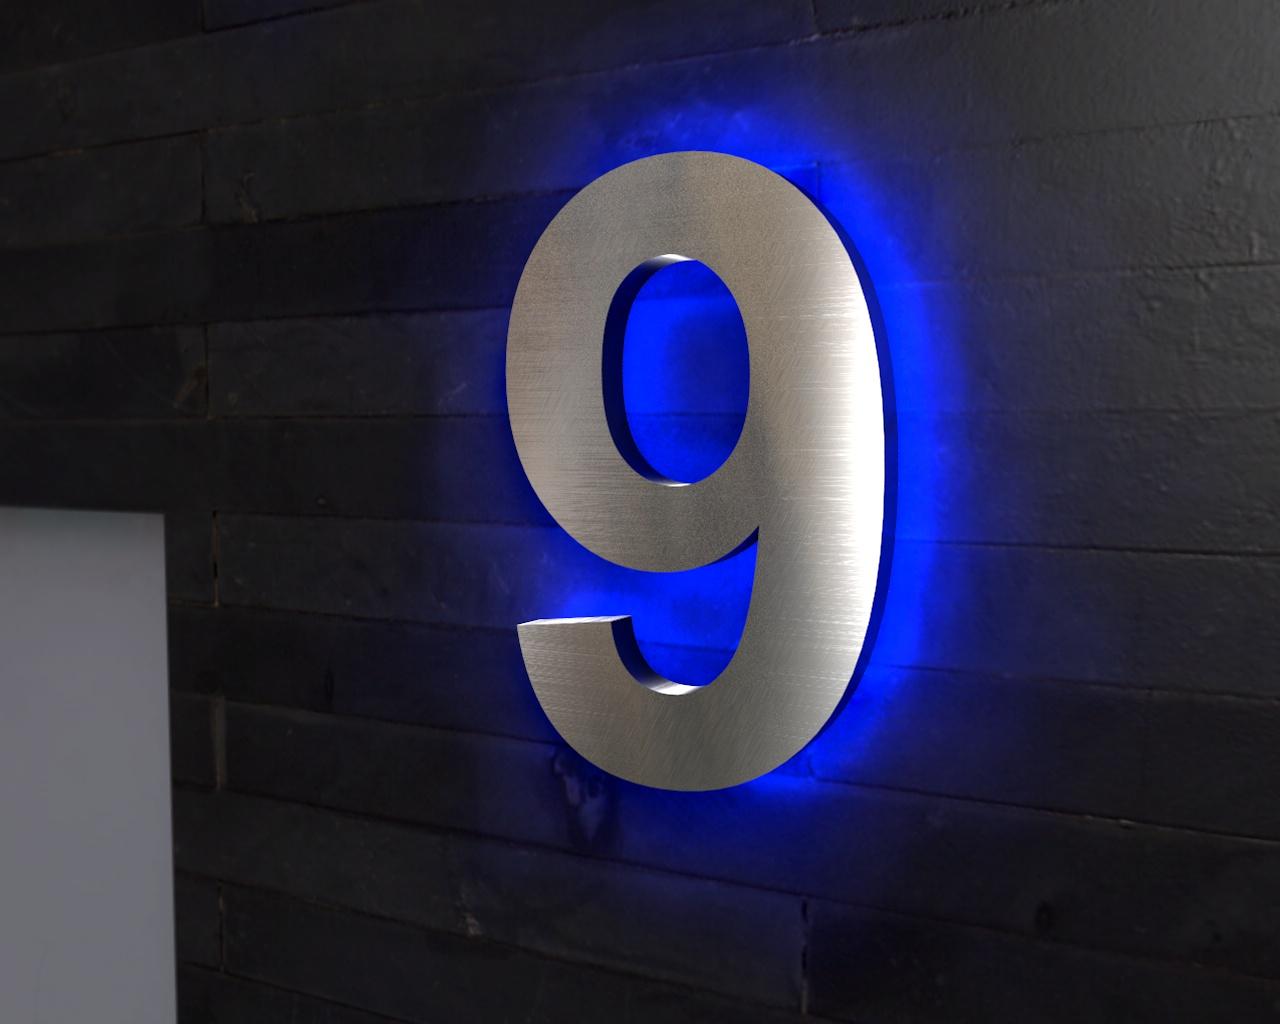 Beleuchtete Hausnummer 9 Ambilight